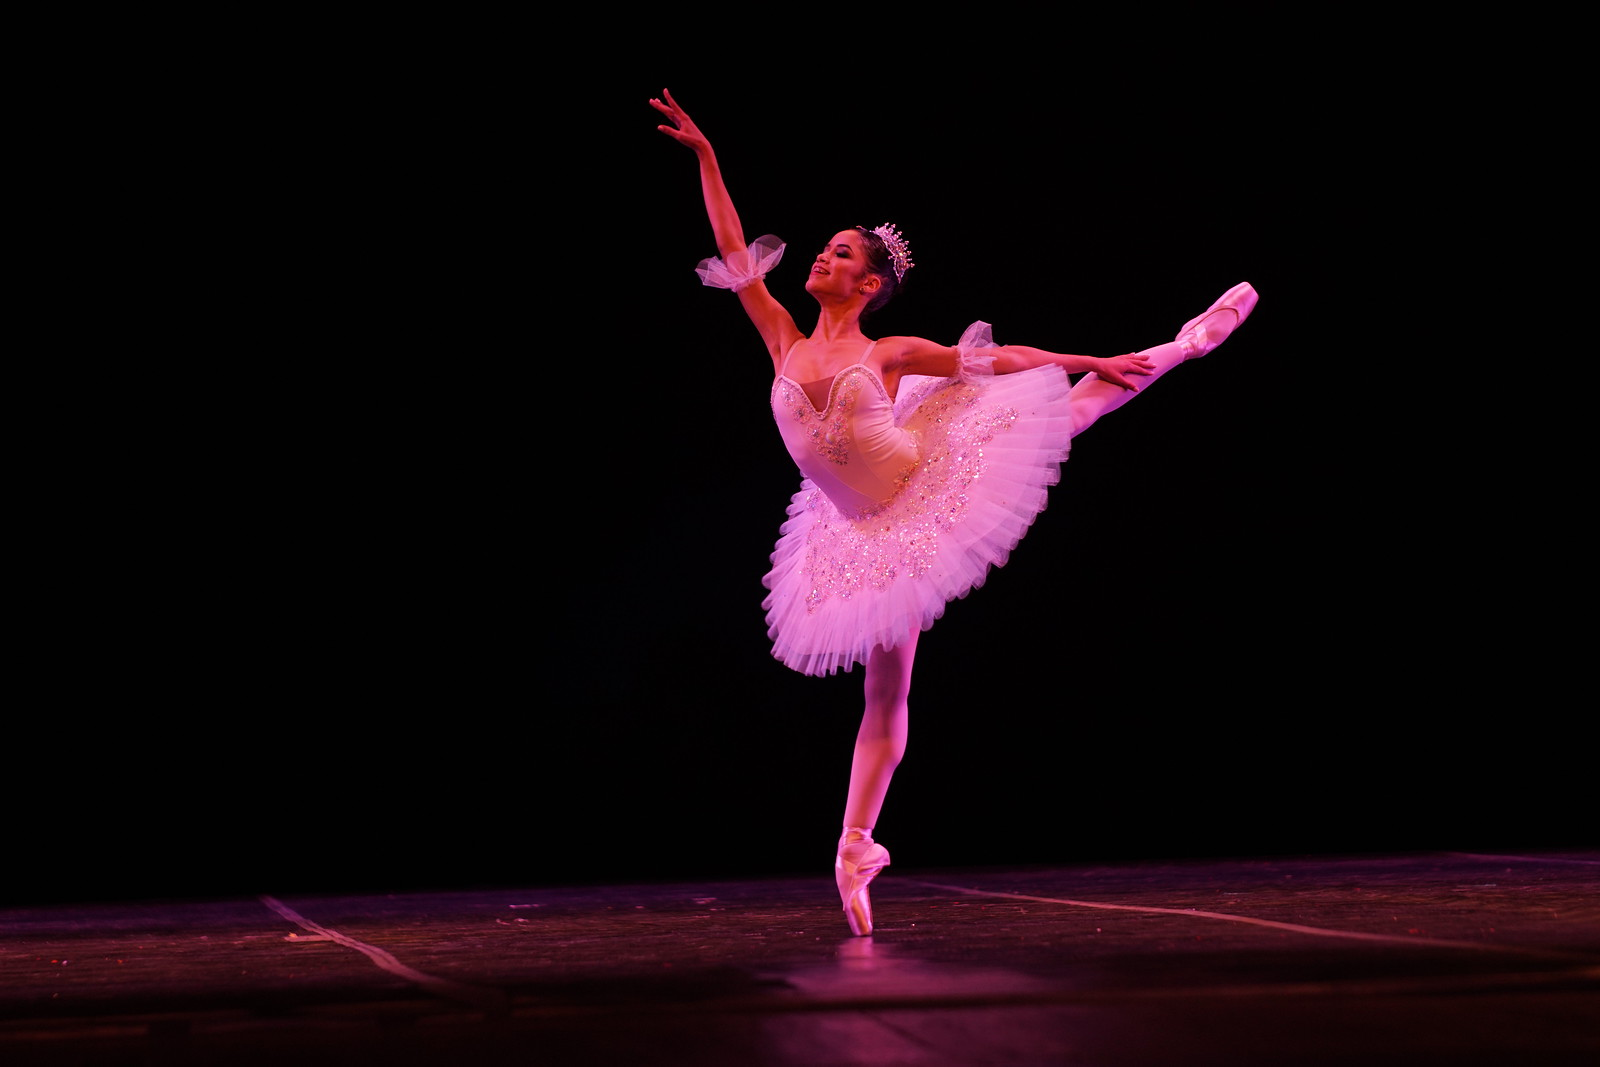 Mostra Competitiva 20.07.2017 - 35º Festival de Dança de Joinville